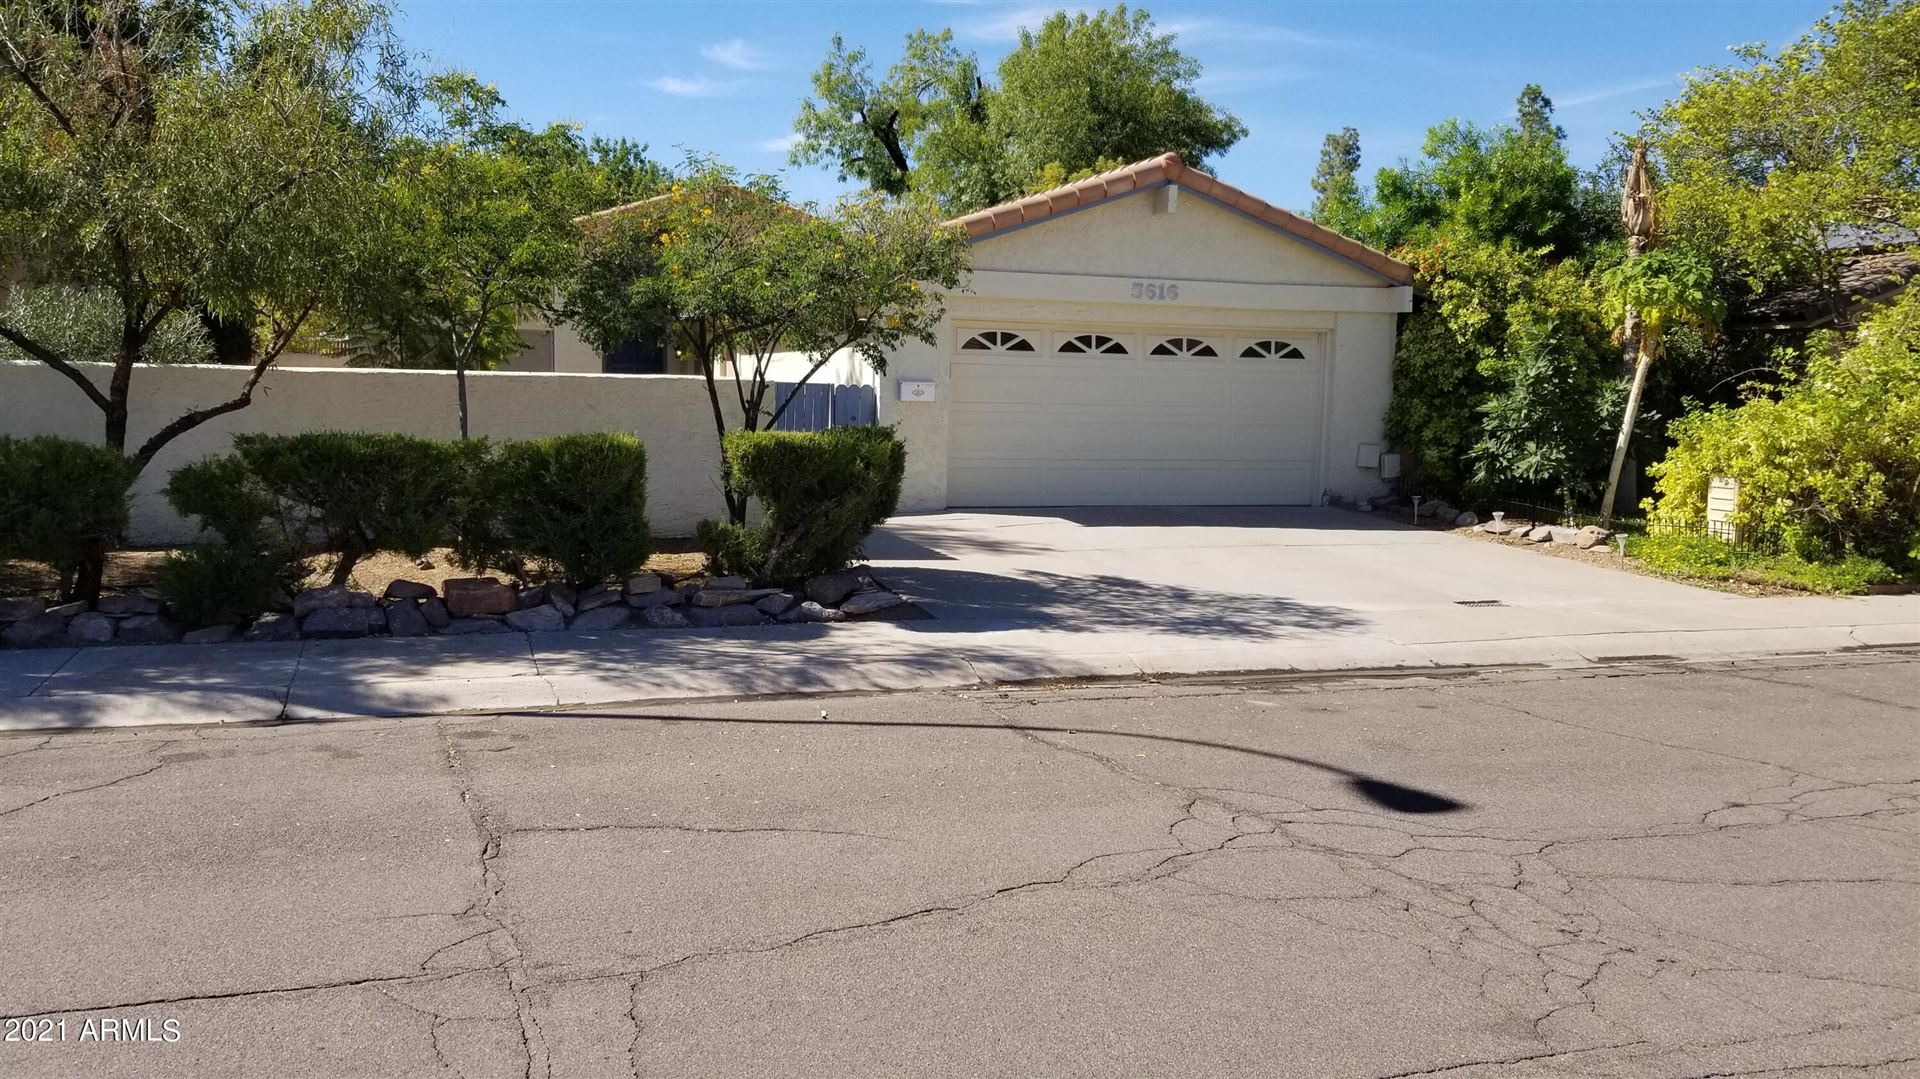 Photo of 5616 S JOLLY ROGER Road, Tempe, AZ 85283 (MLS # 6310877)